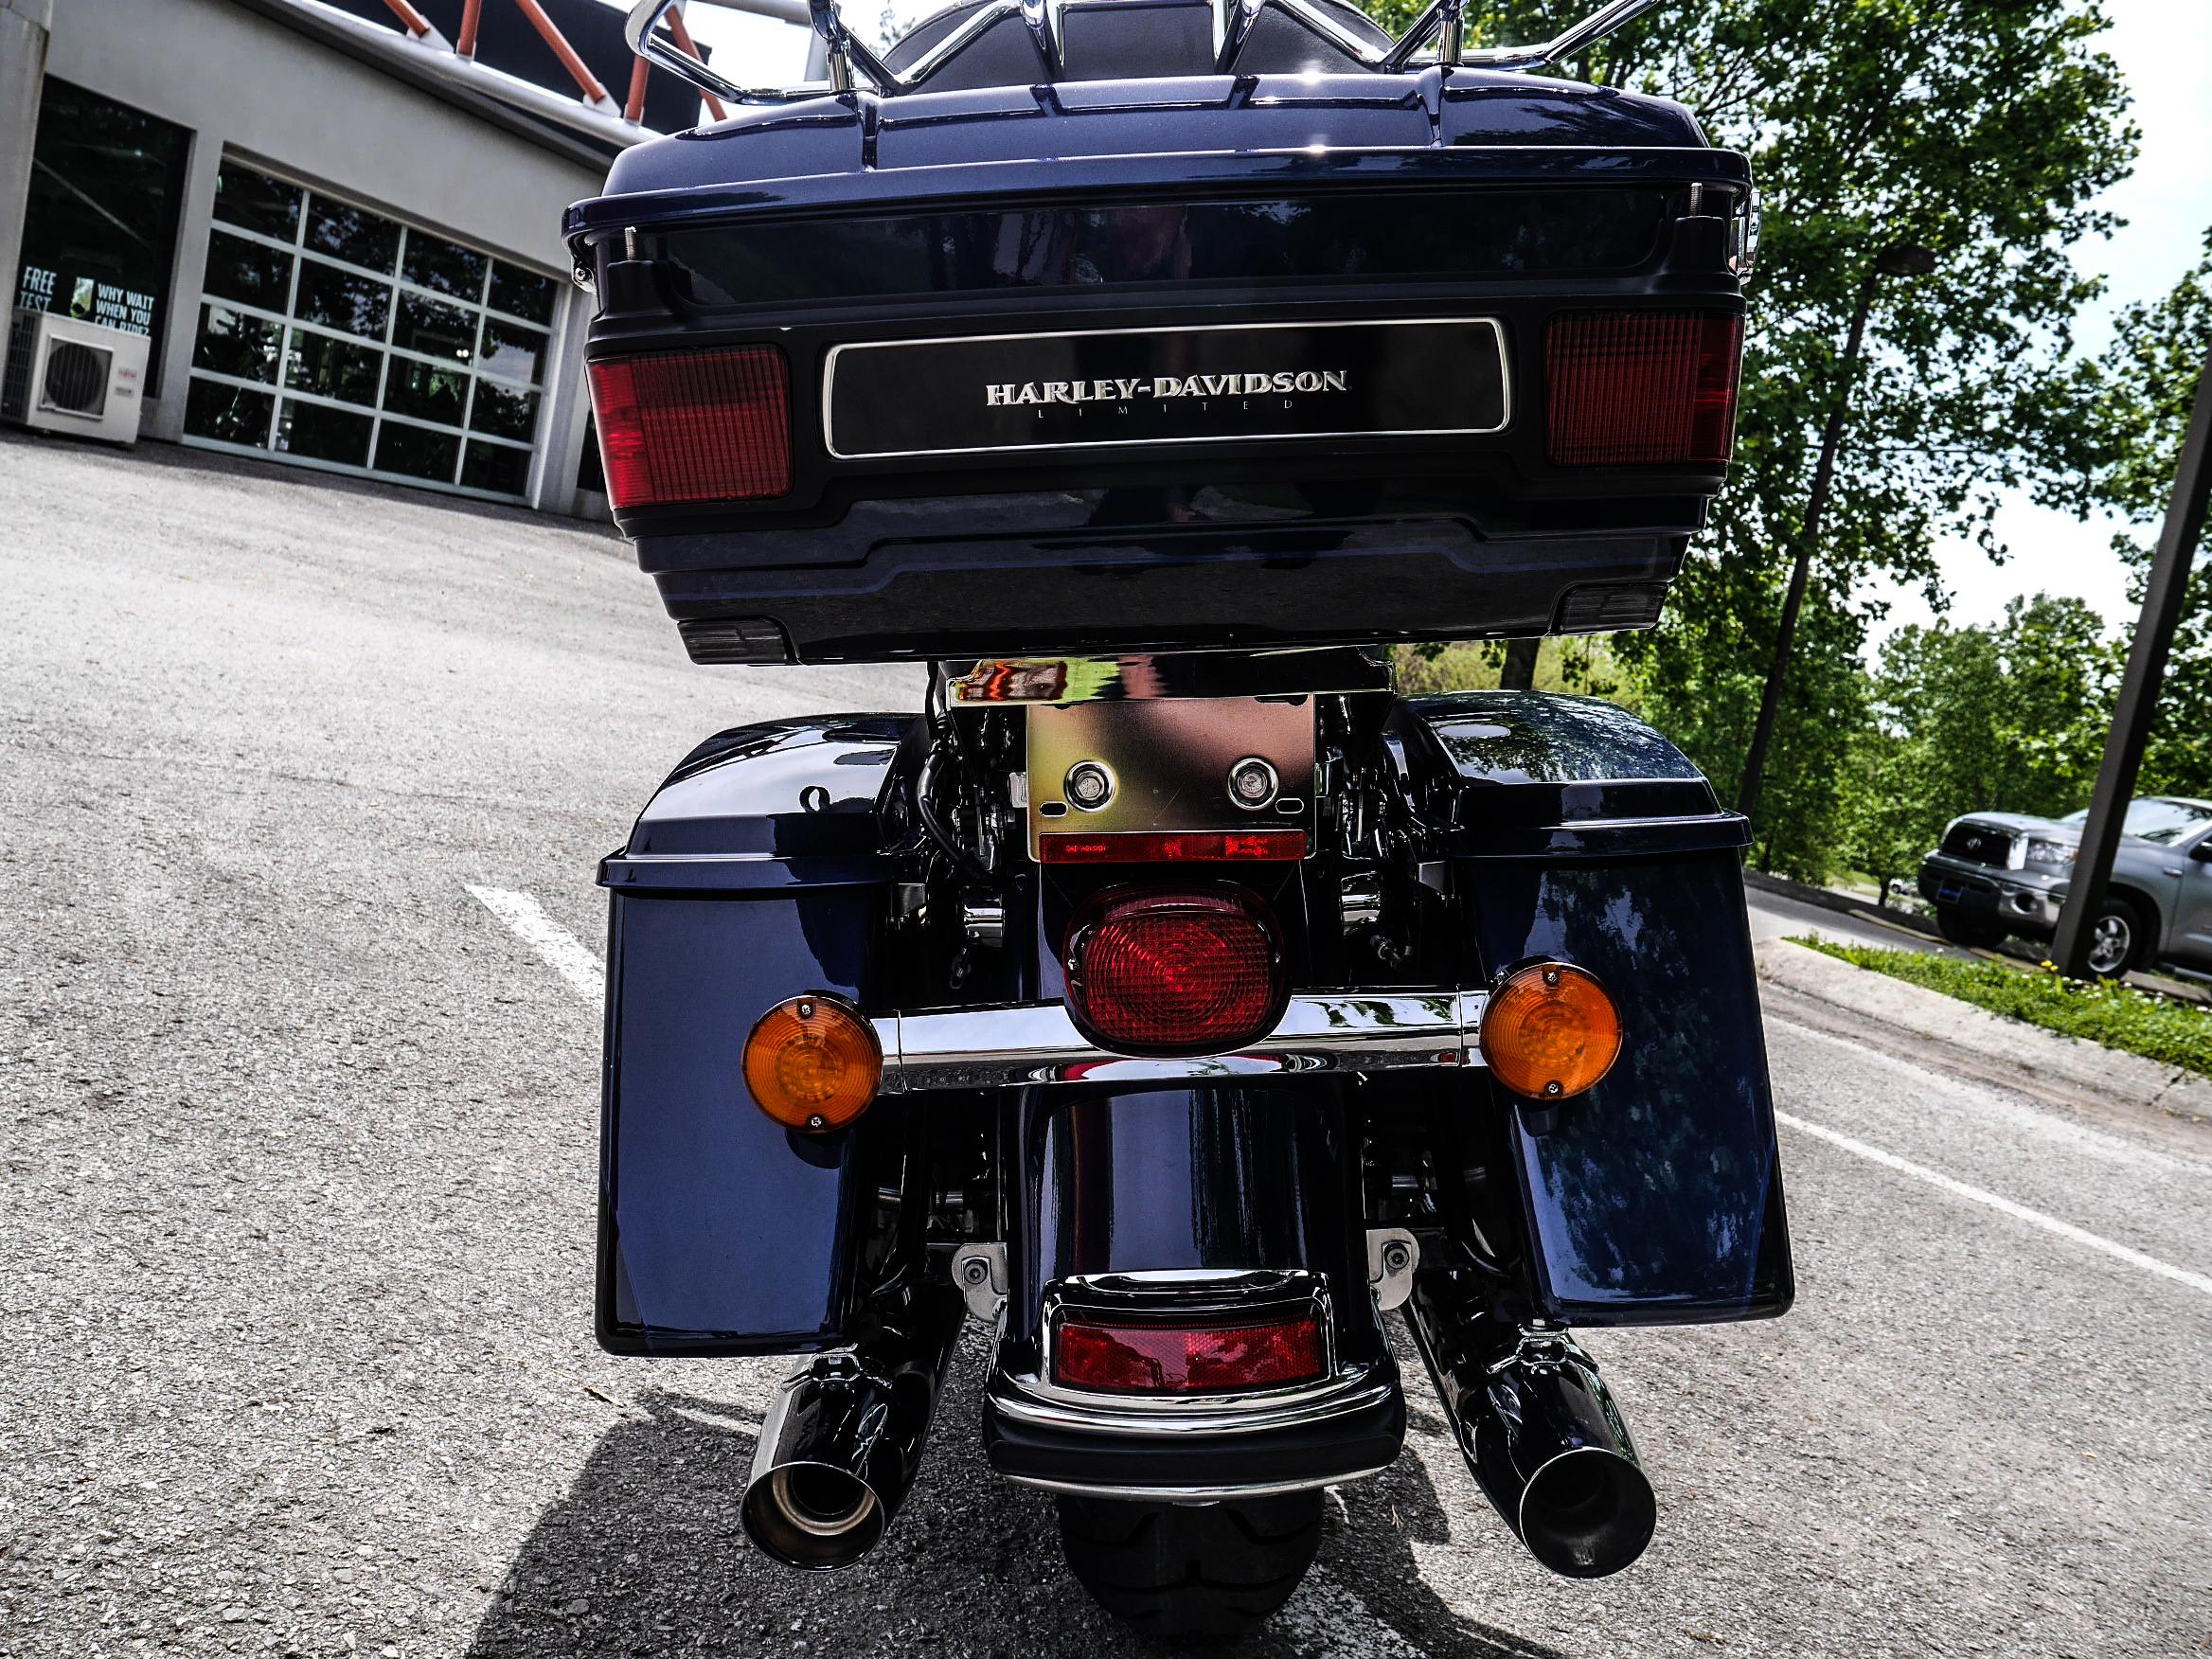 Pre-Owned 2013 Harley-Davidson Electra Glide Ultra Limited